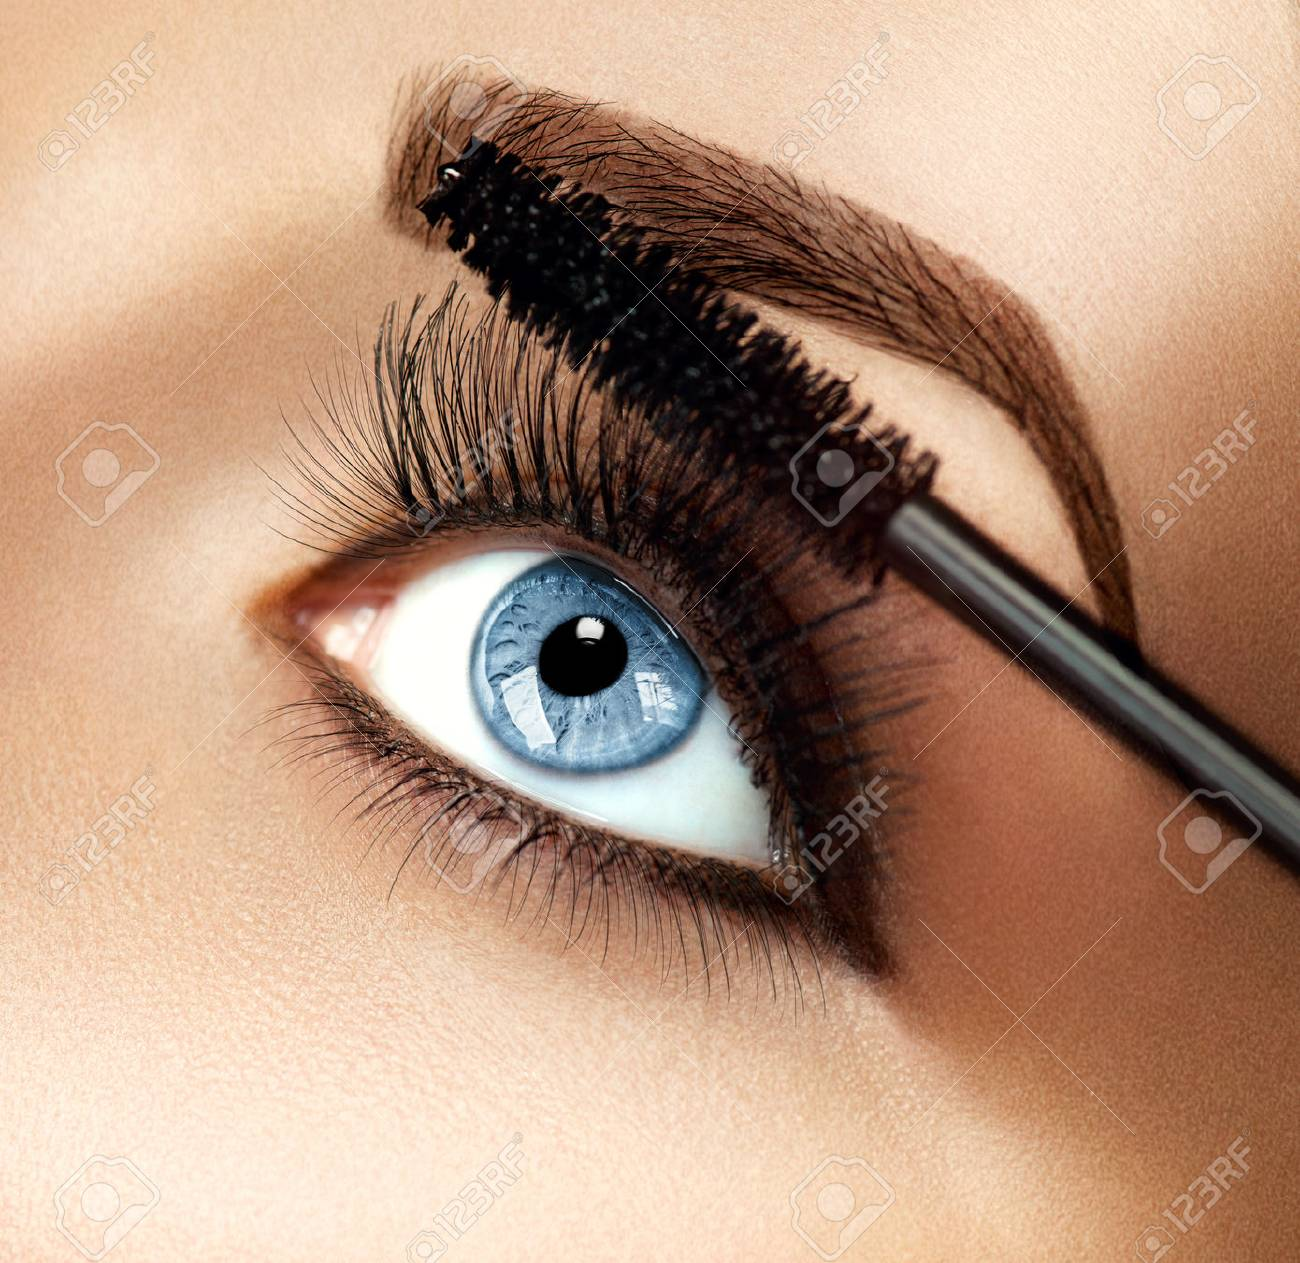 ae56d492189 Mascara makeup applying closeup. Eyelashes extensions Stock Photo - 48843072